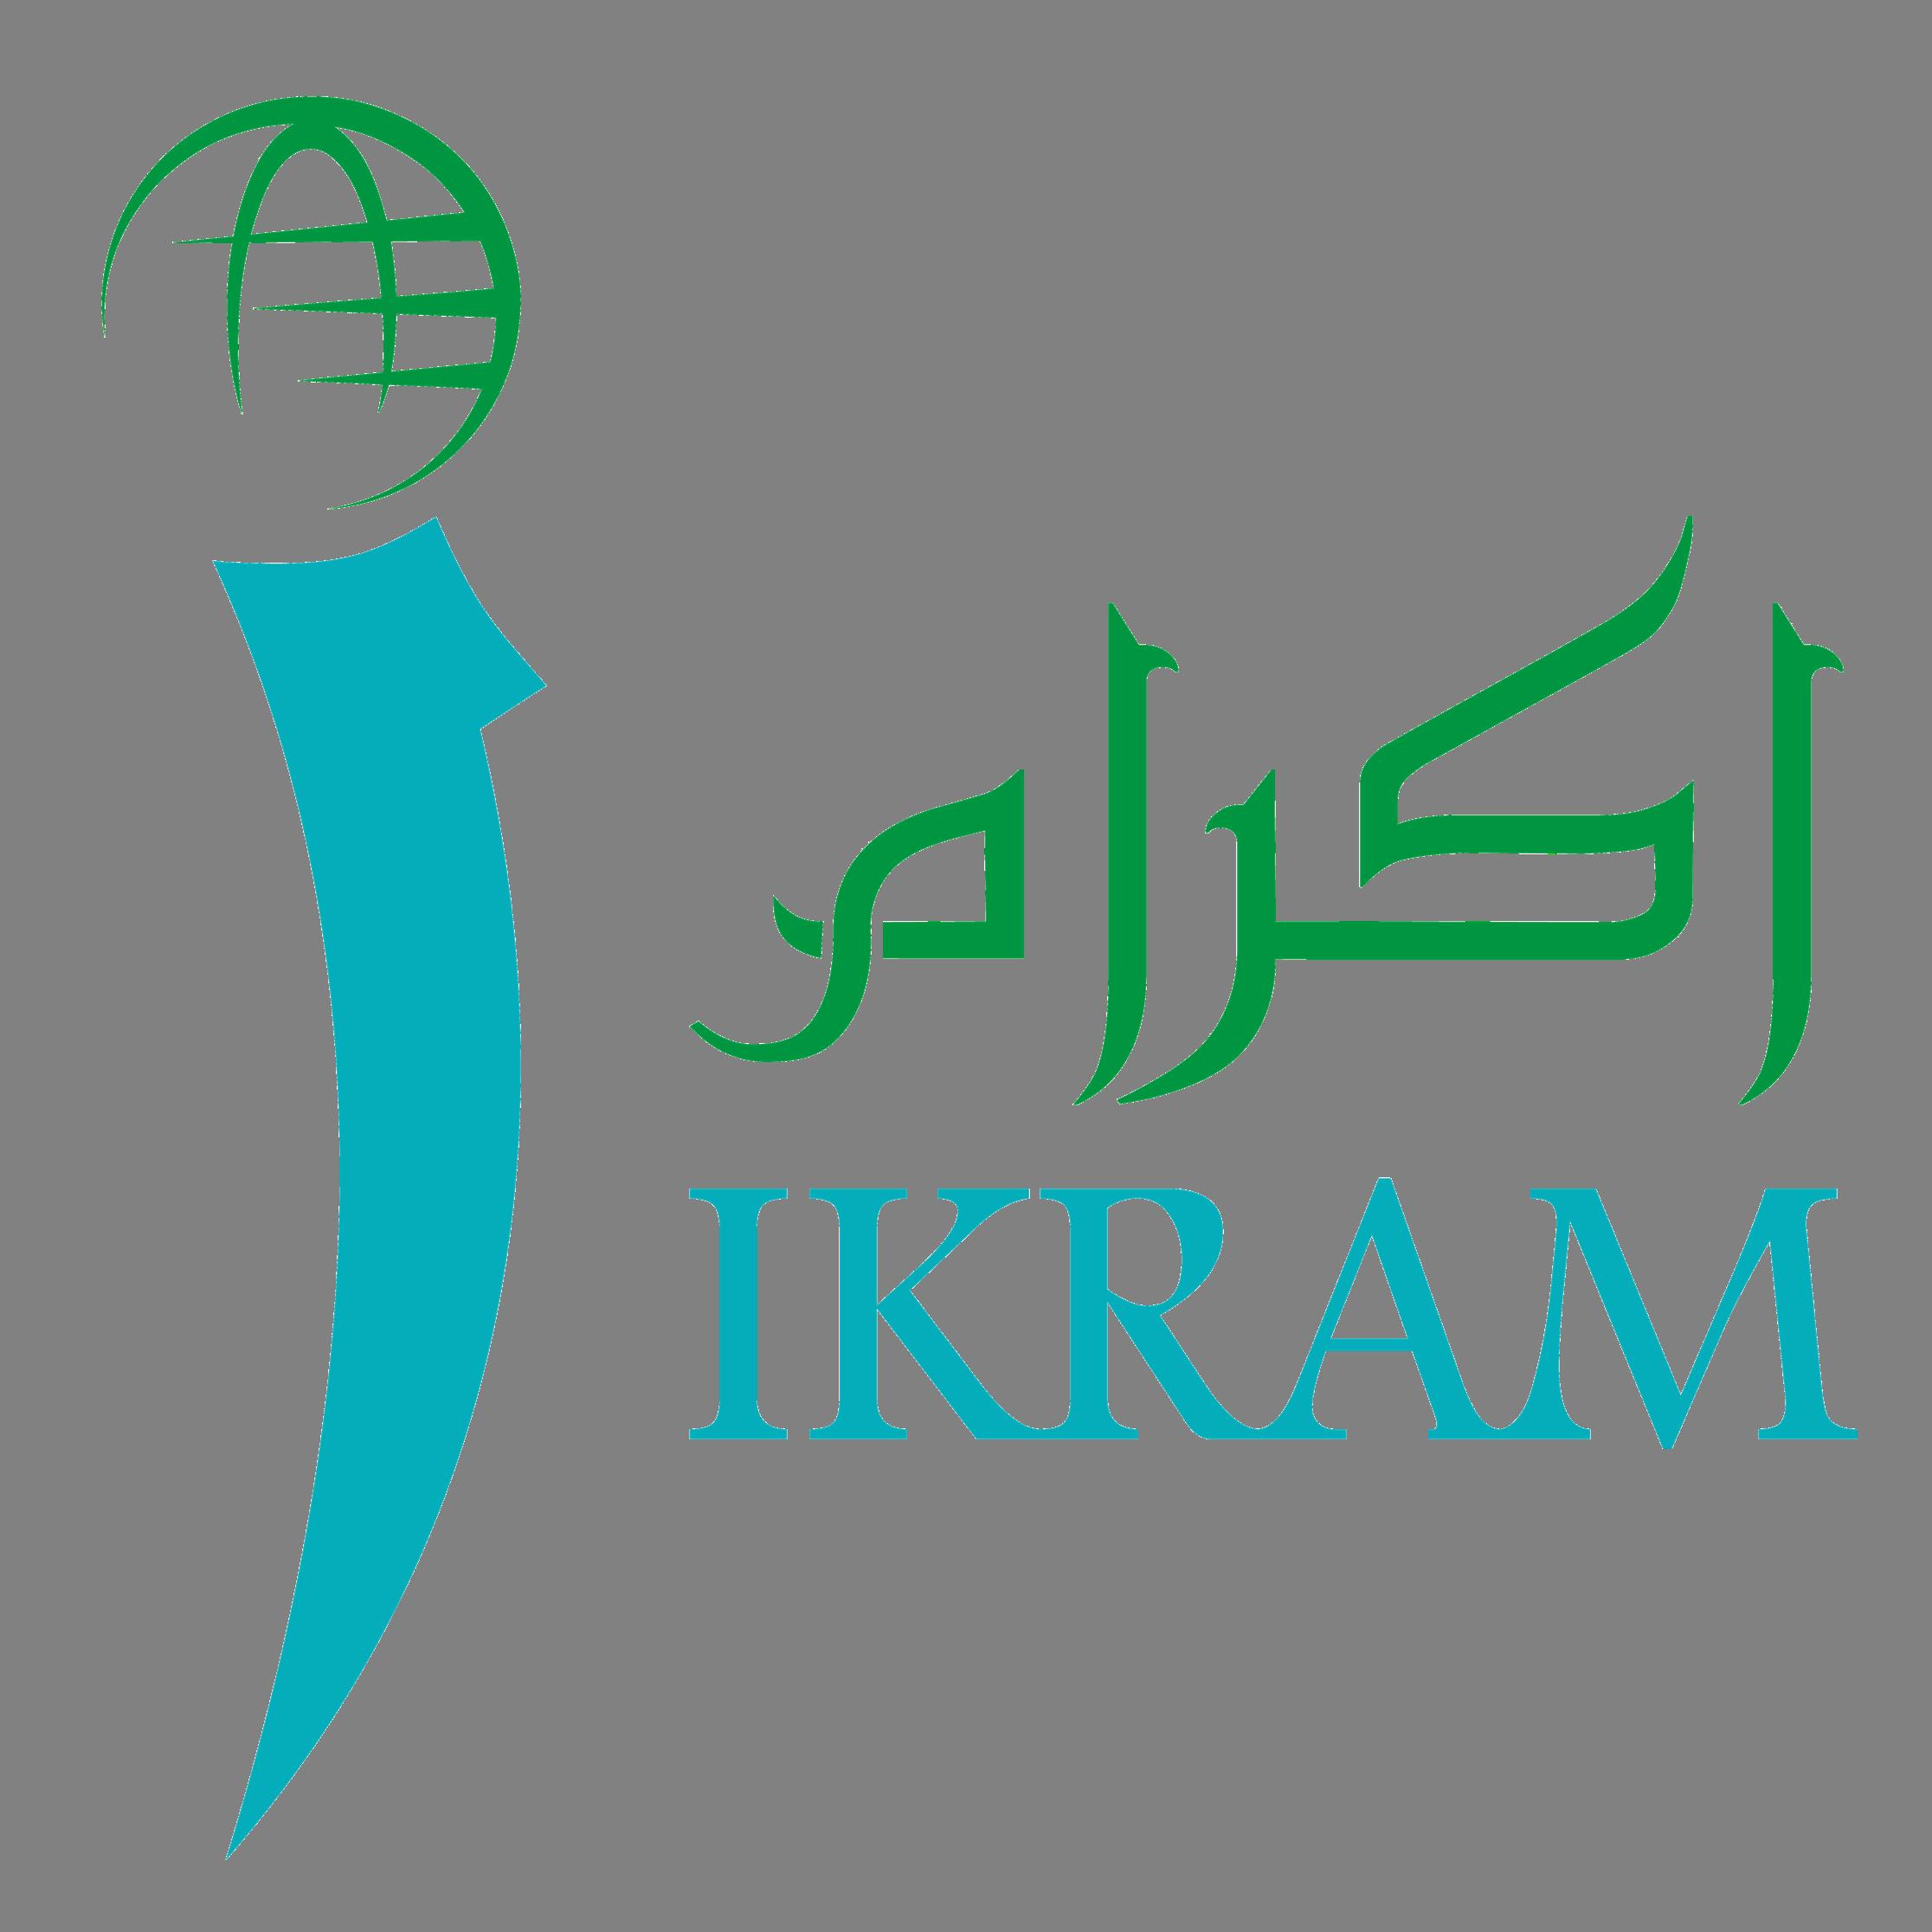 ikram-original